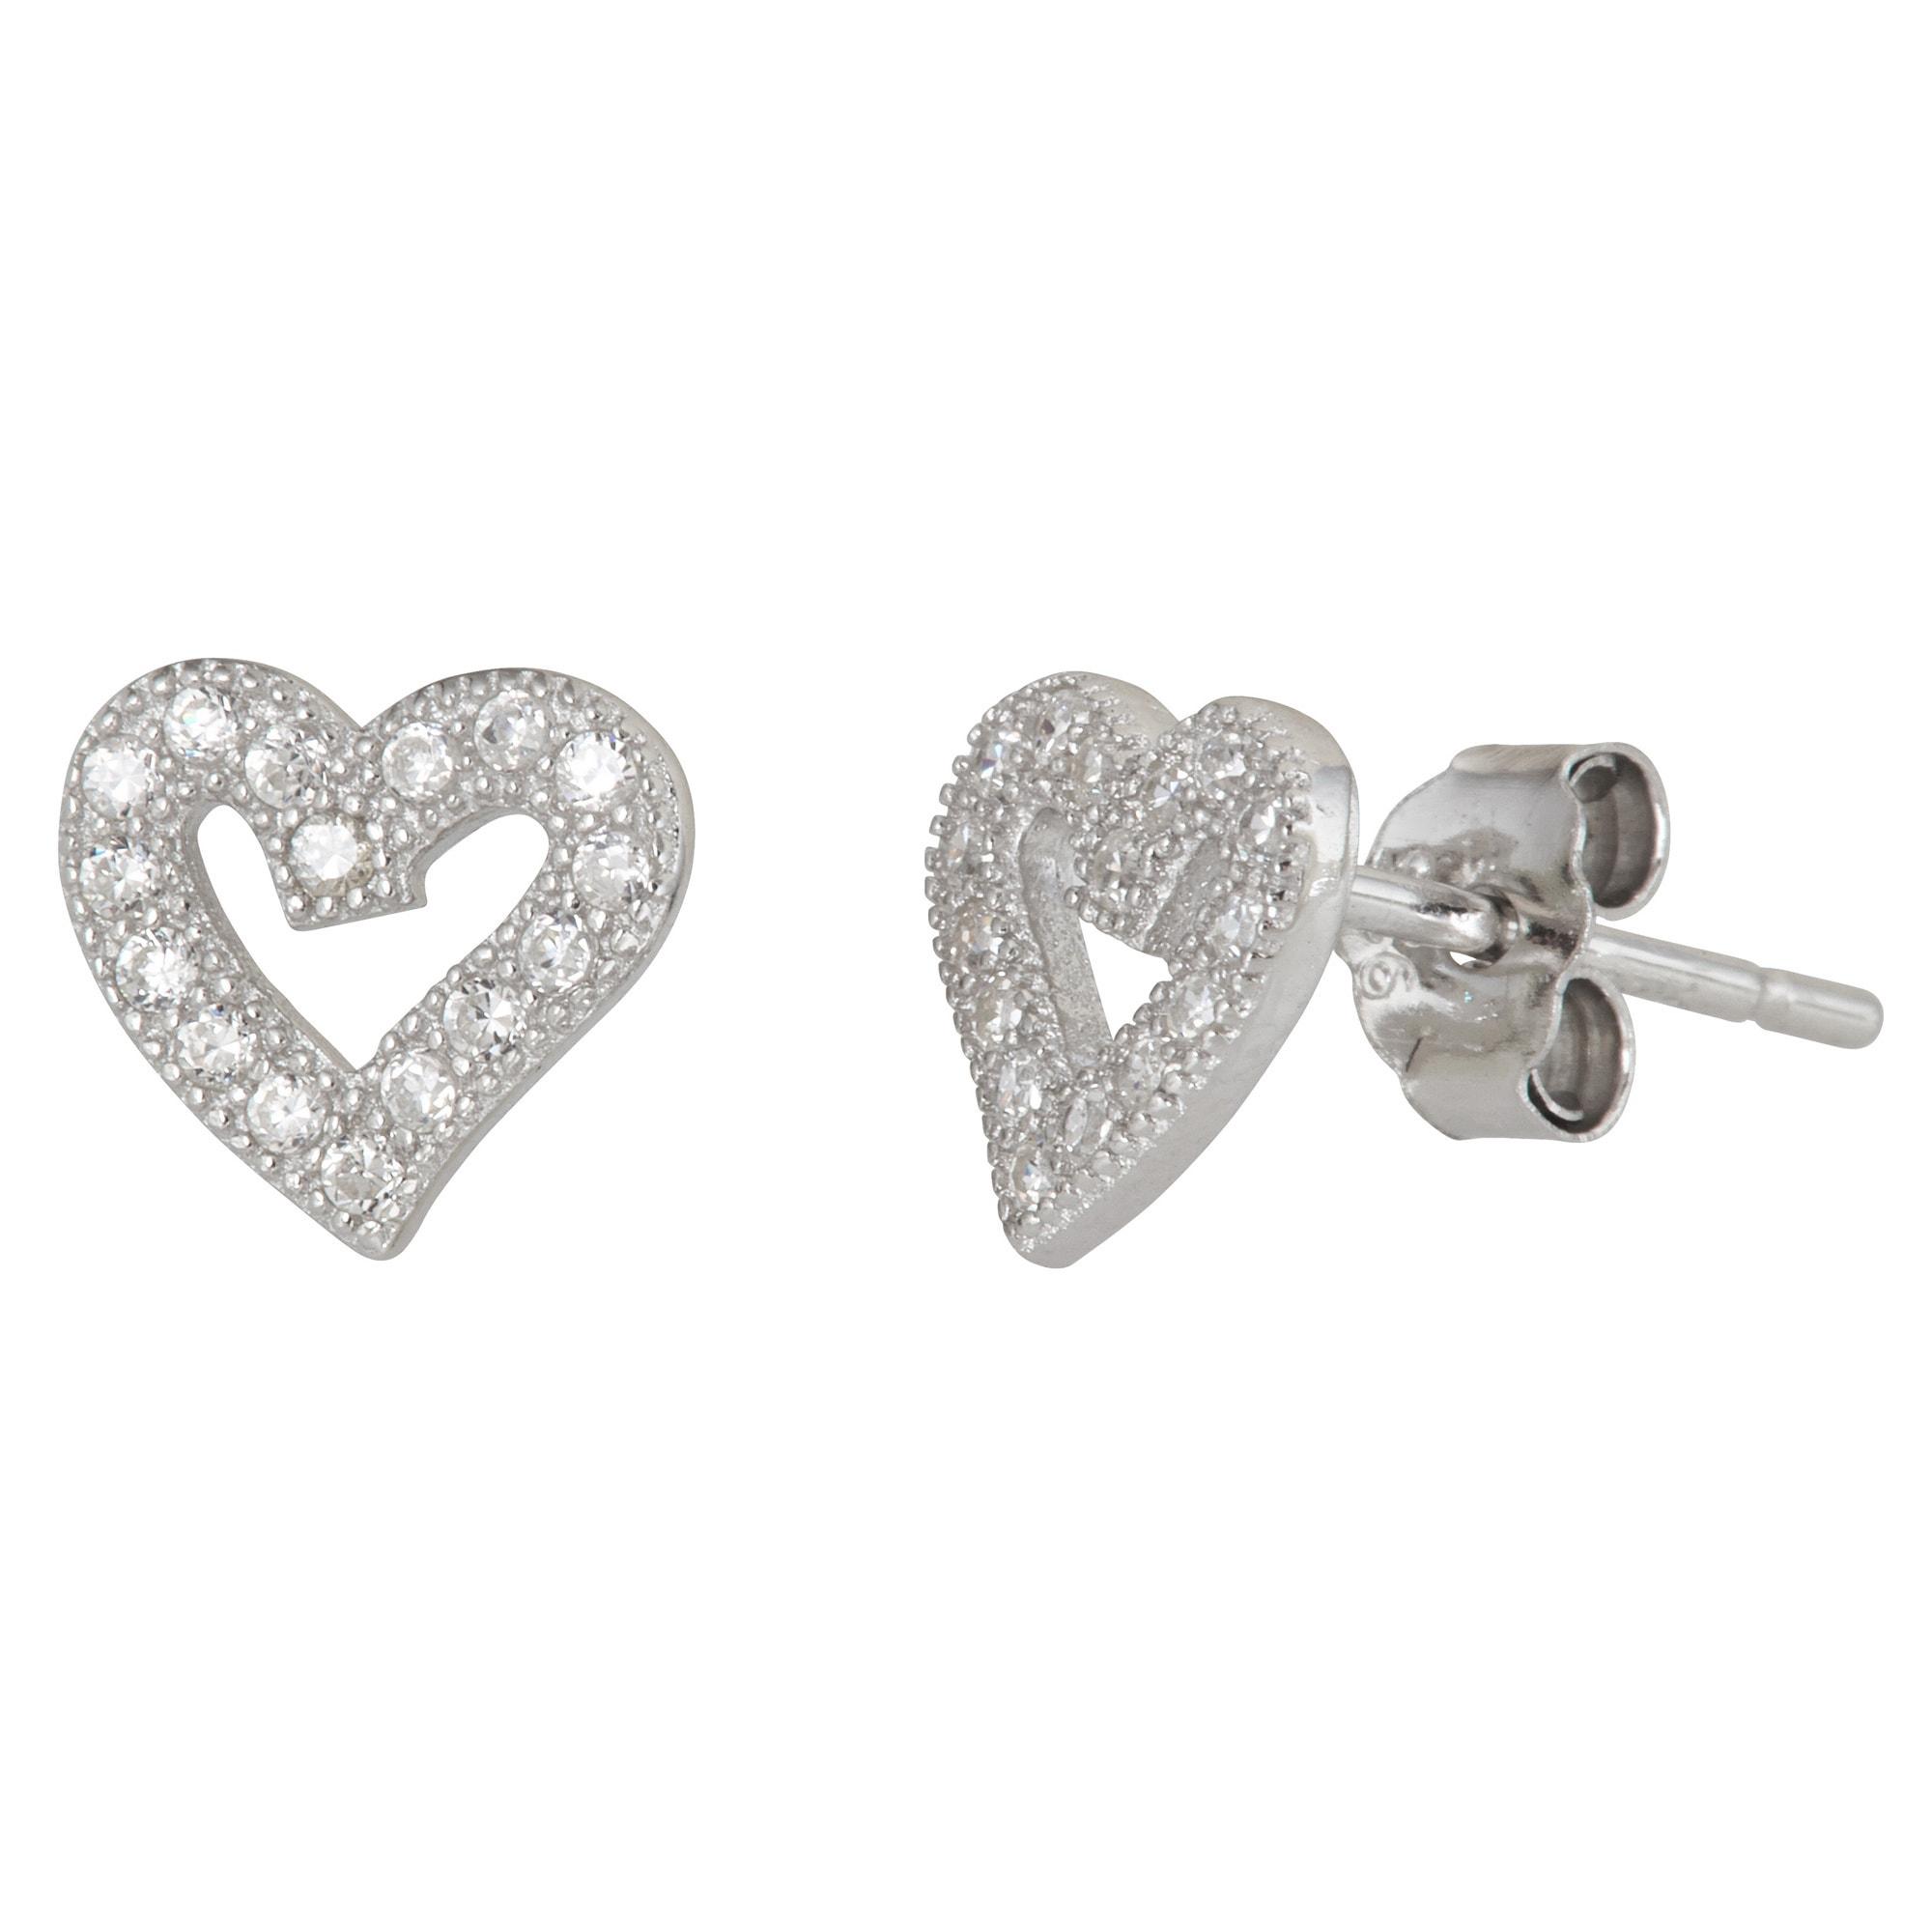 Cubic Zurconian Bling Diamond Paved Heart Diamond Earrings